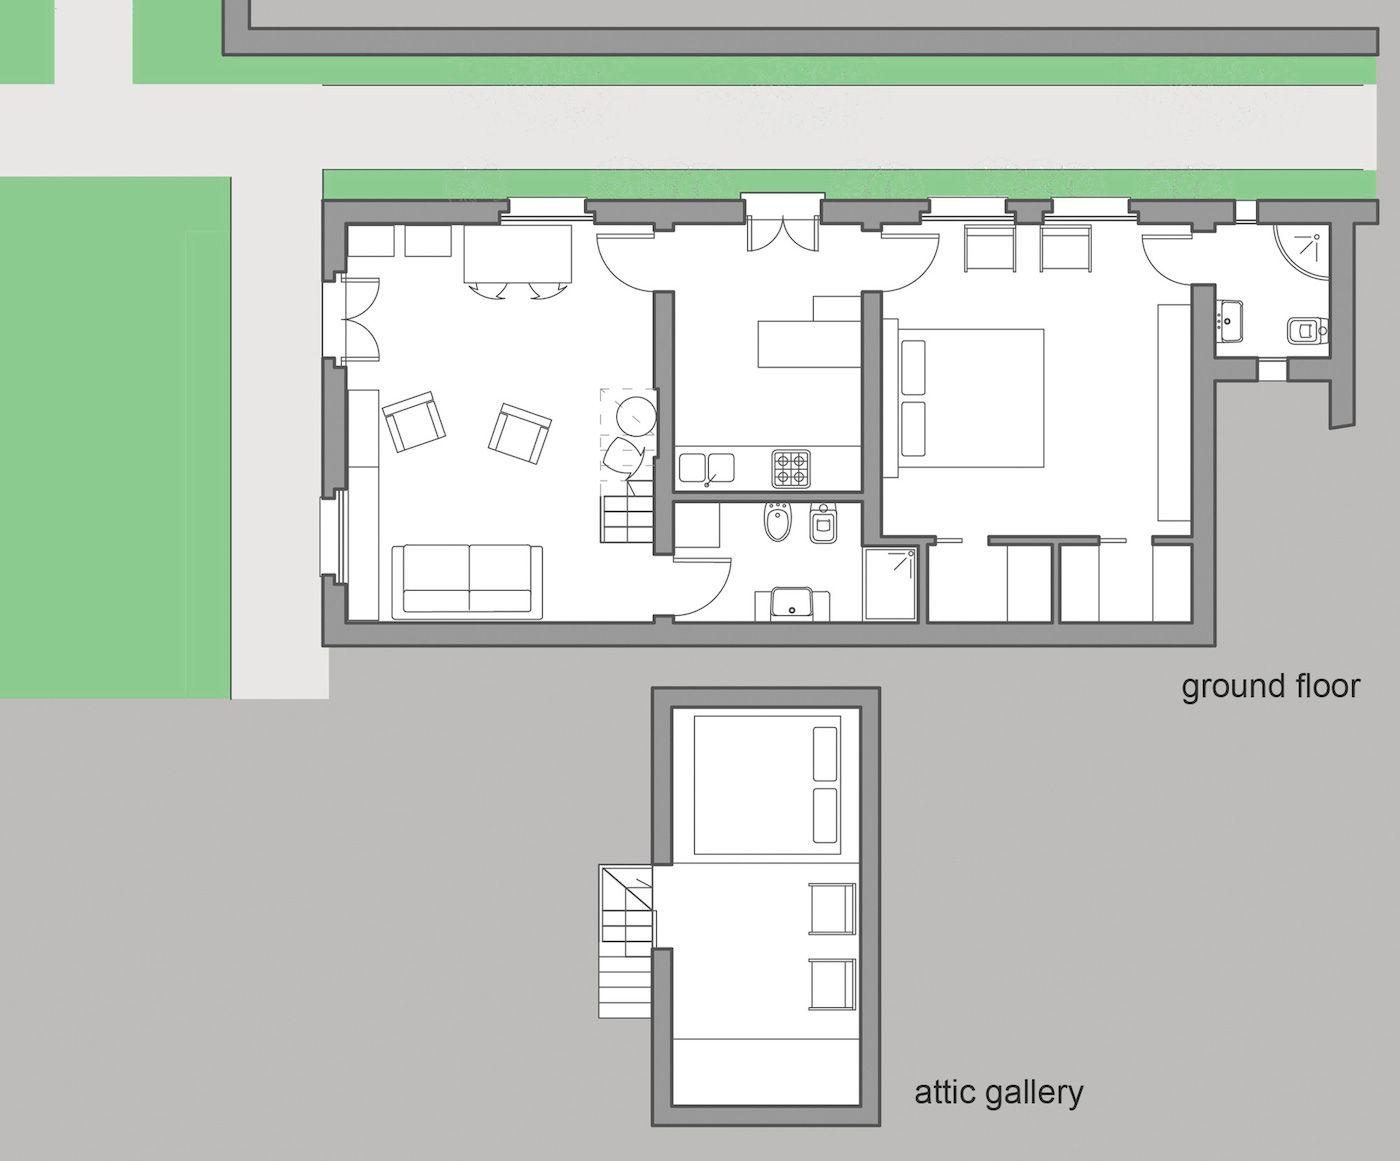 Dolfin floor plan